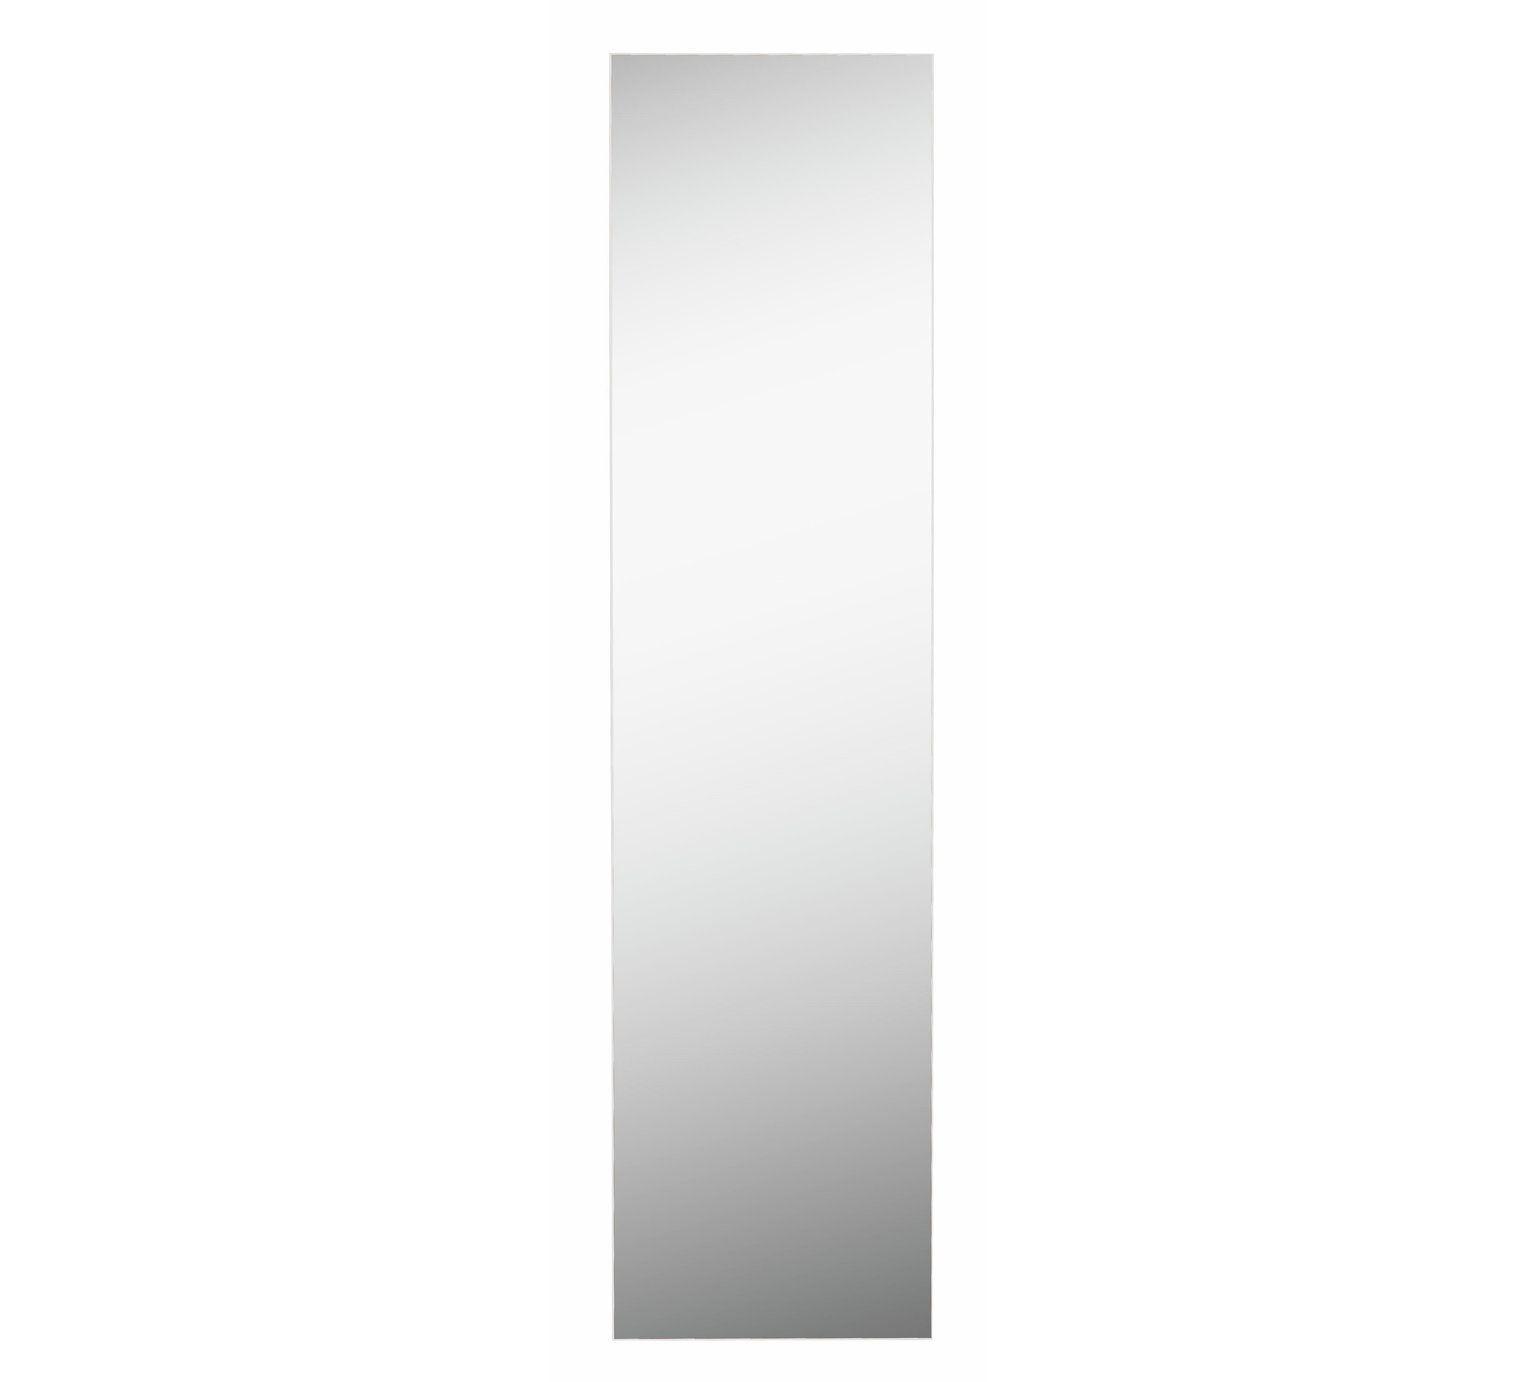 Buy Home Full Length Frameless Wall Mirror At Argos Visit